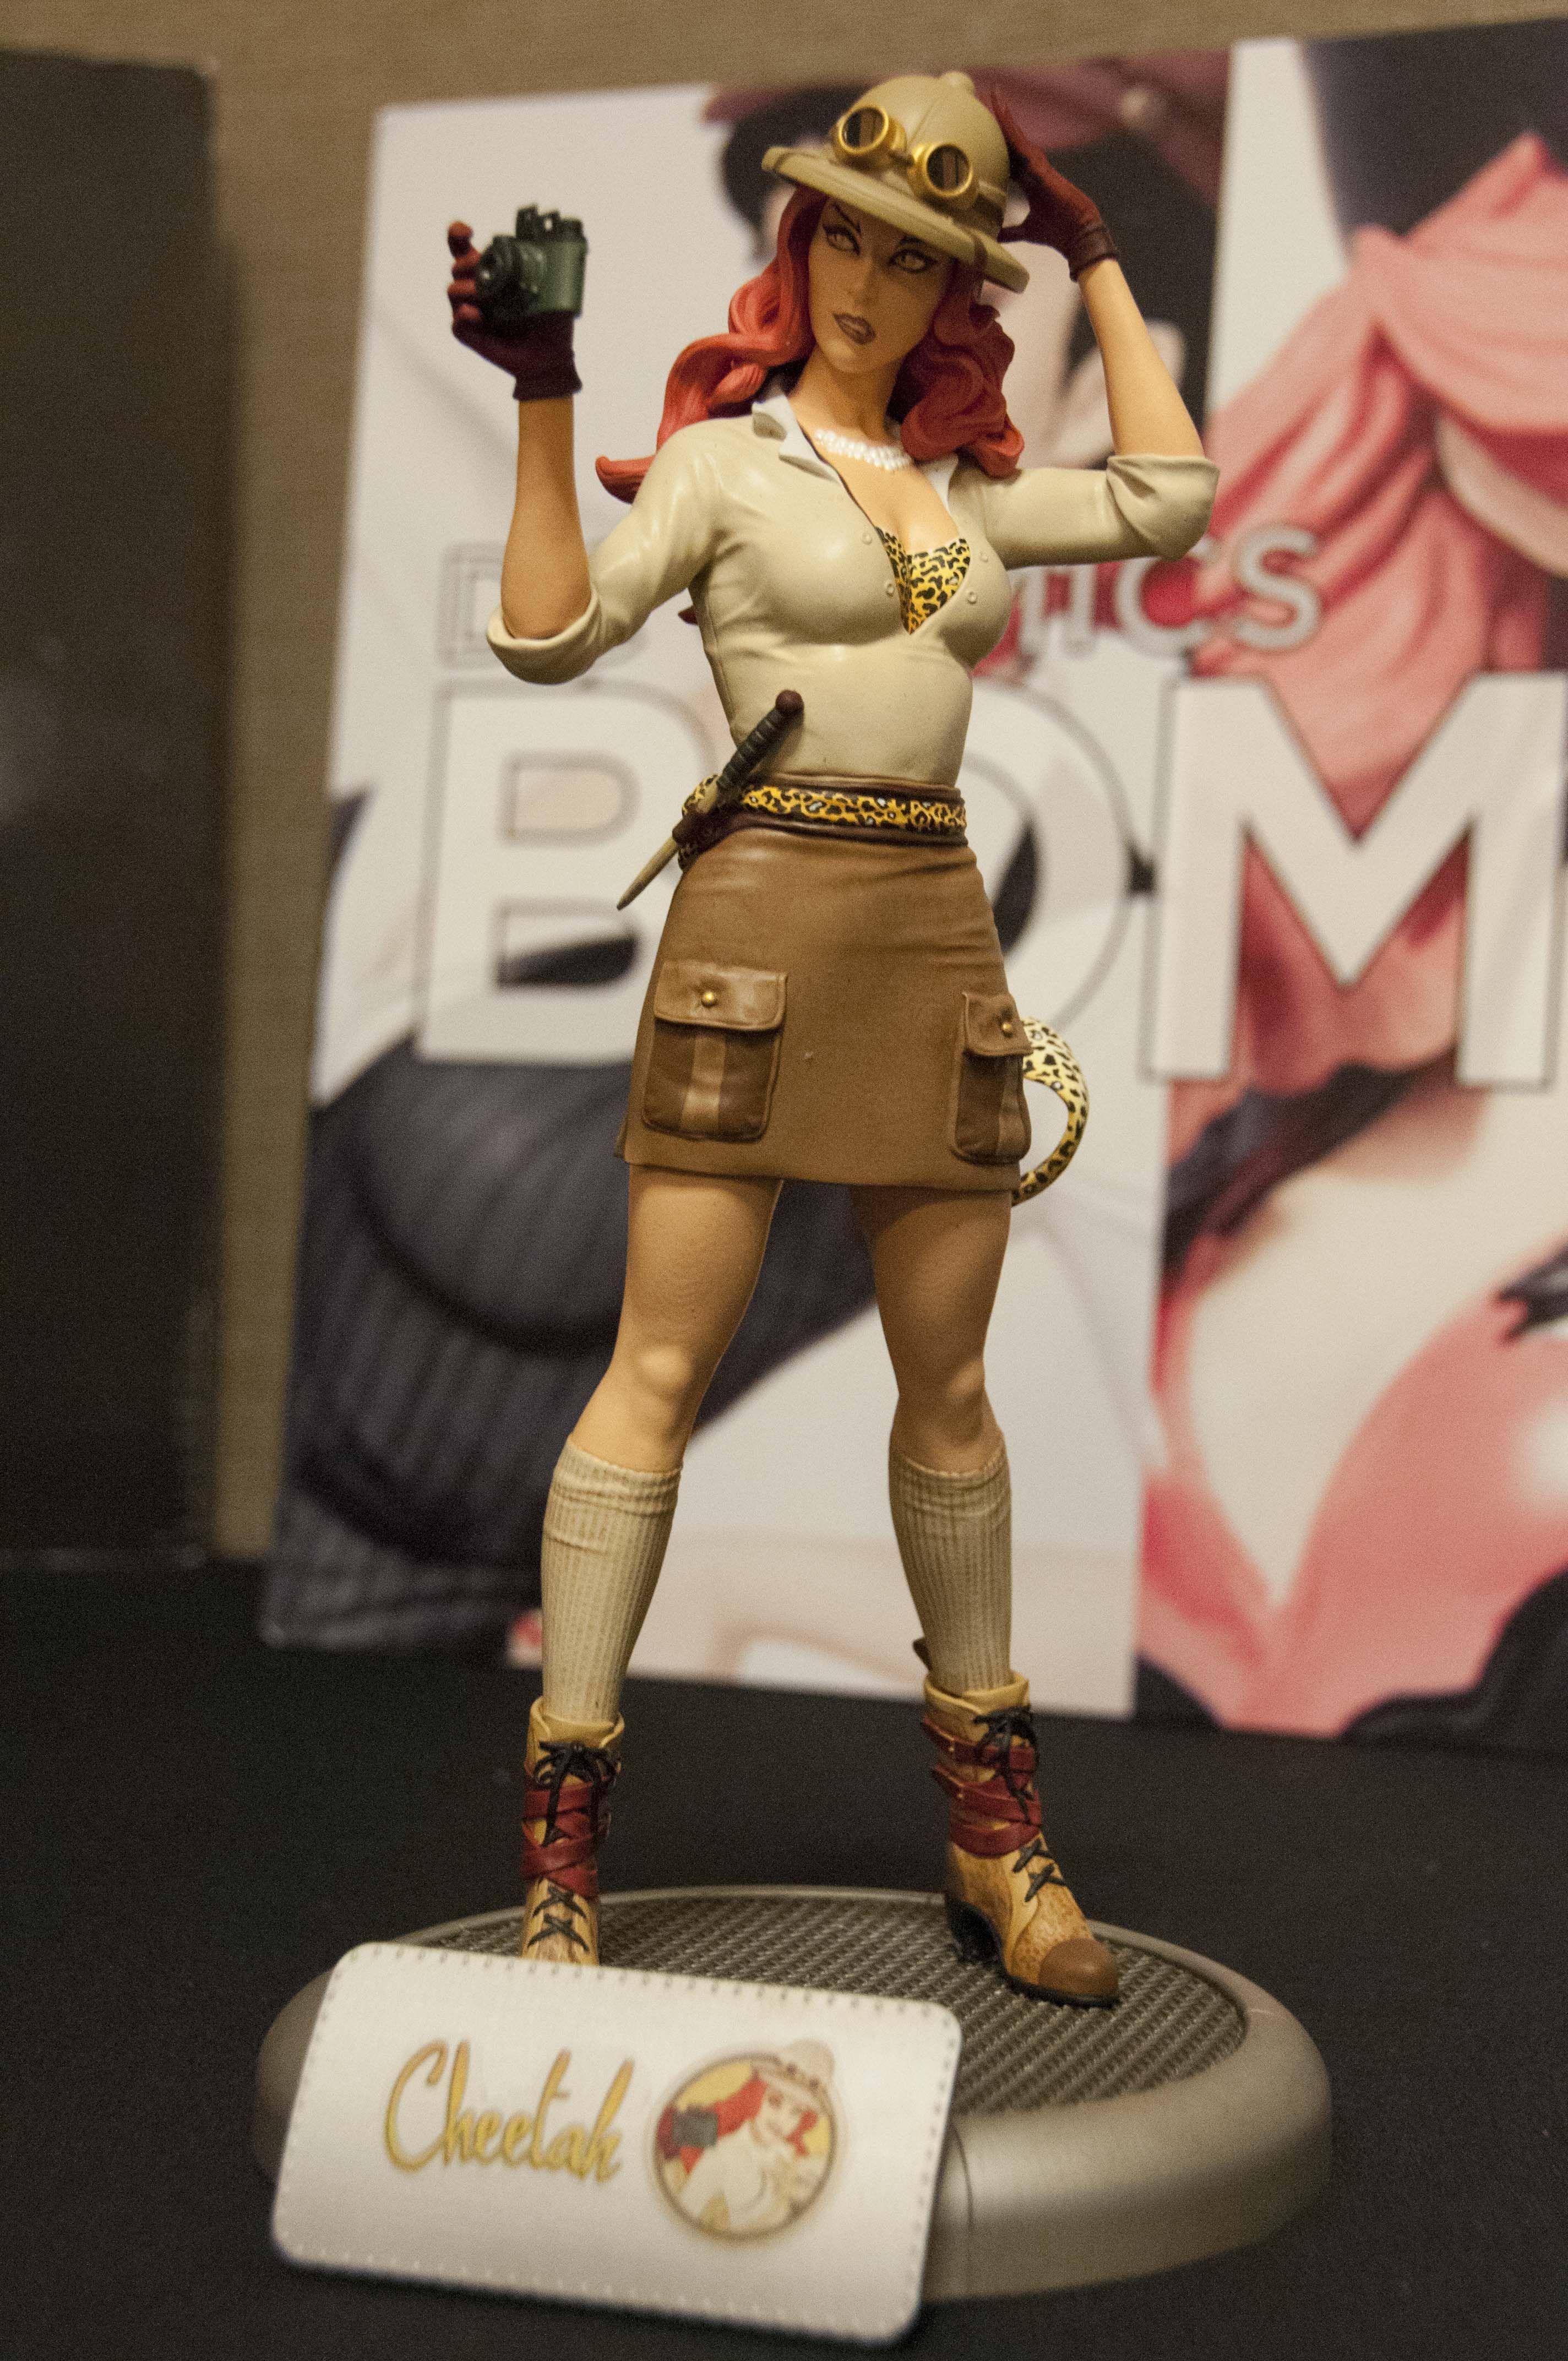 Cheetah Bombshells Statue Dc Direct DC COMICS